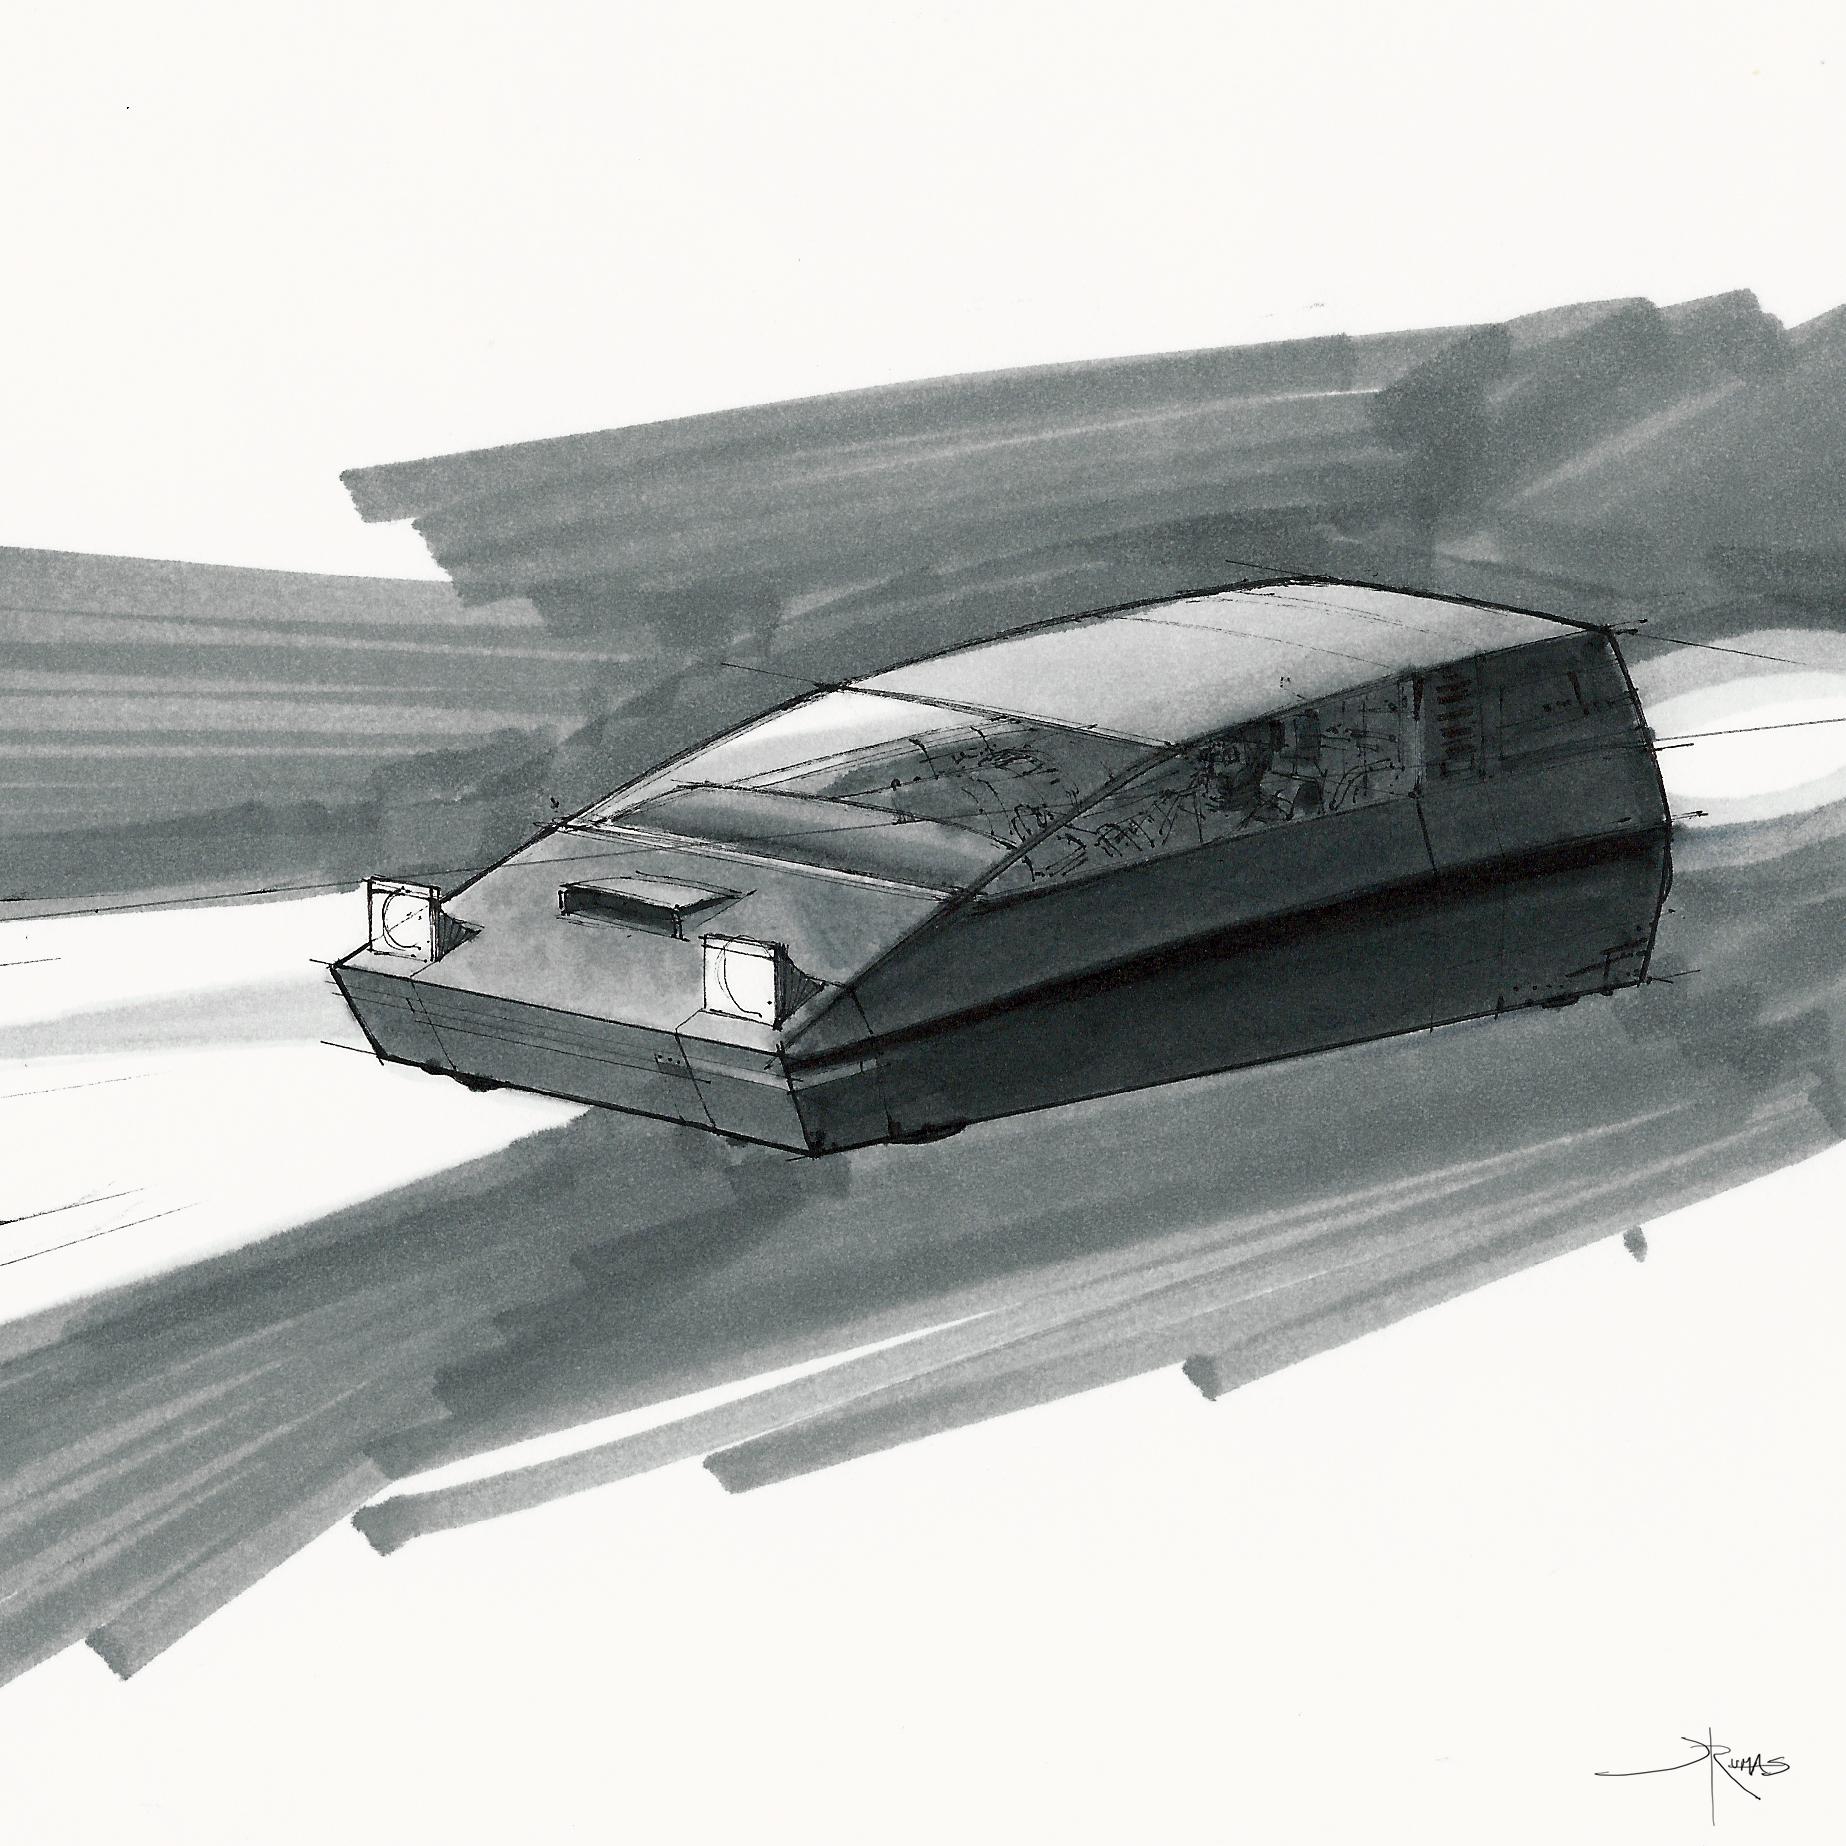 racer vs chaser - racer vehicle design sketch by Jeremy Rumas